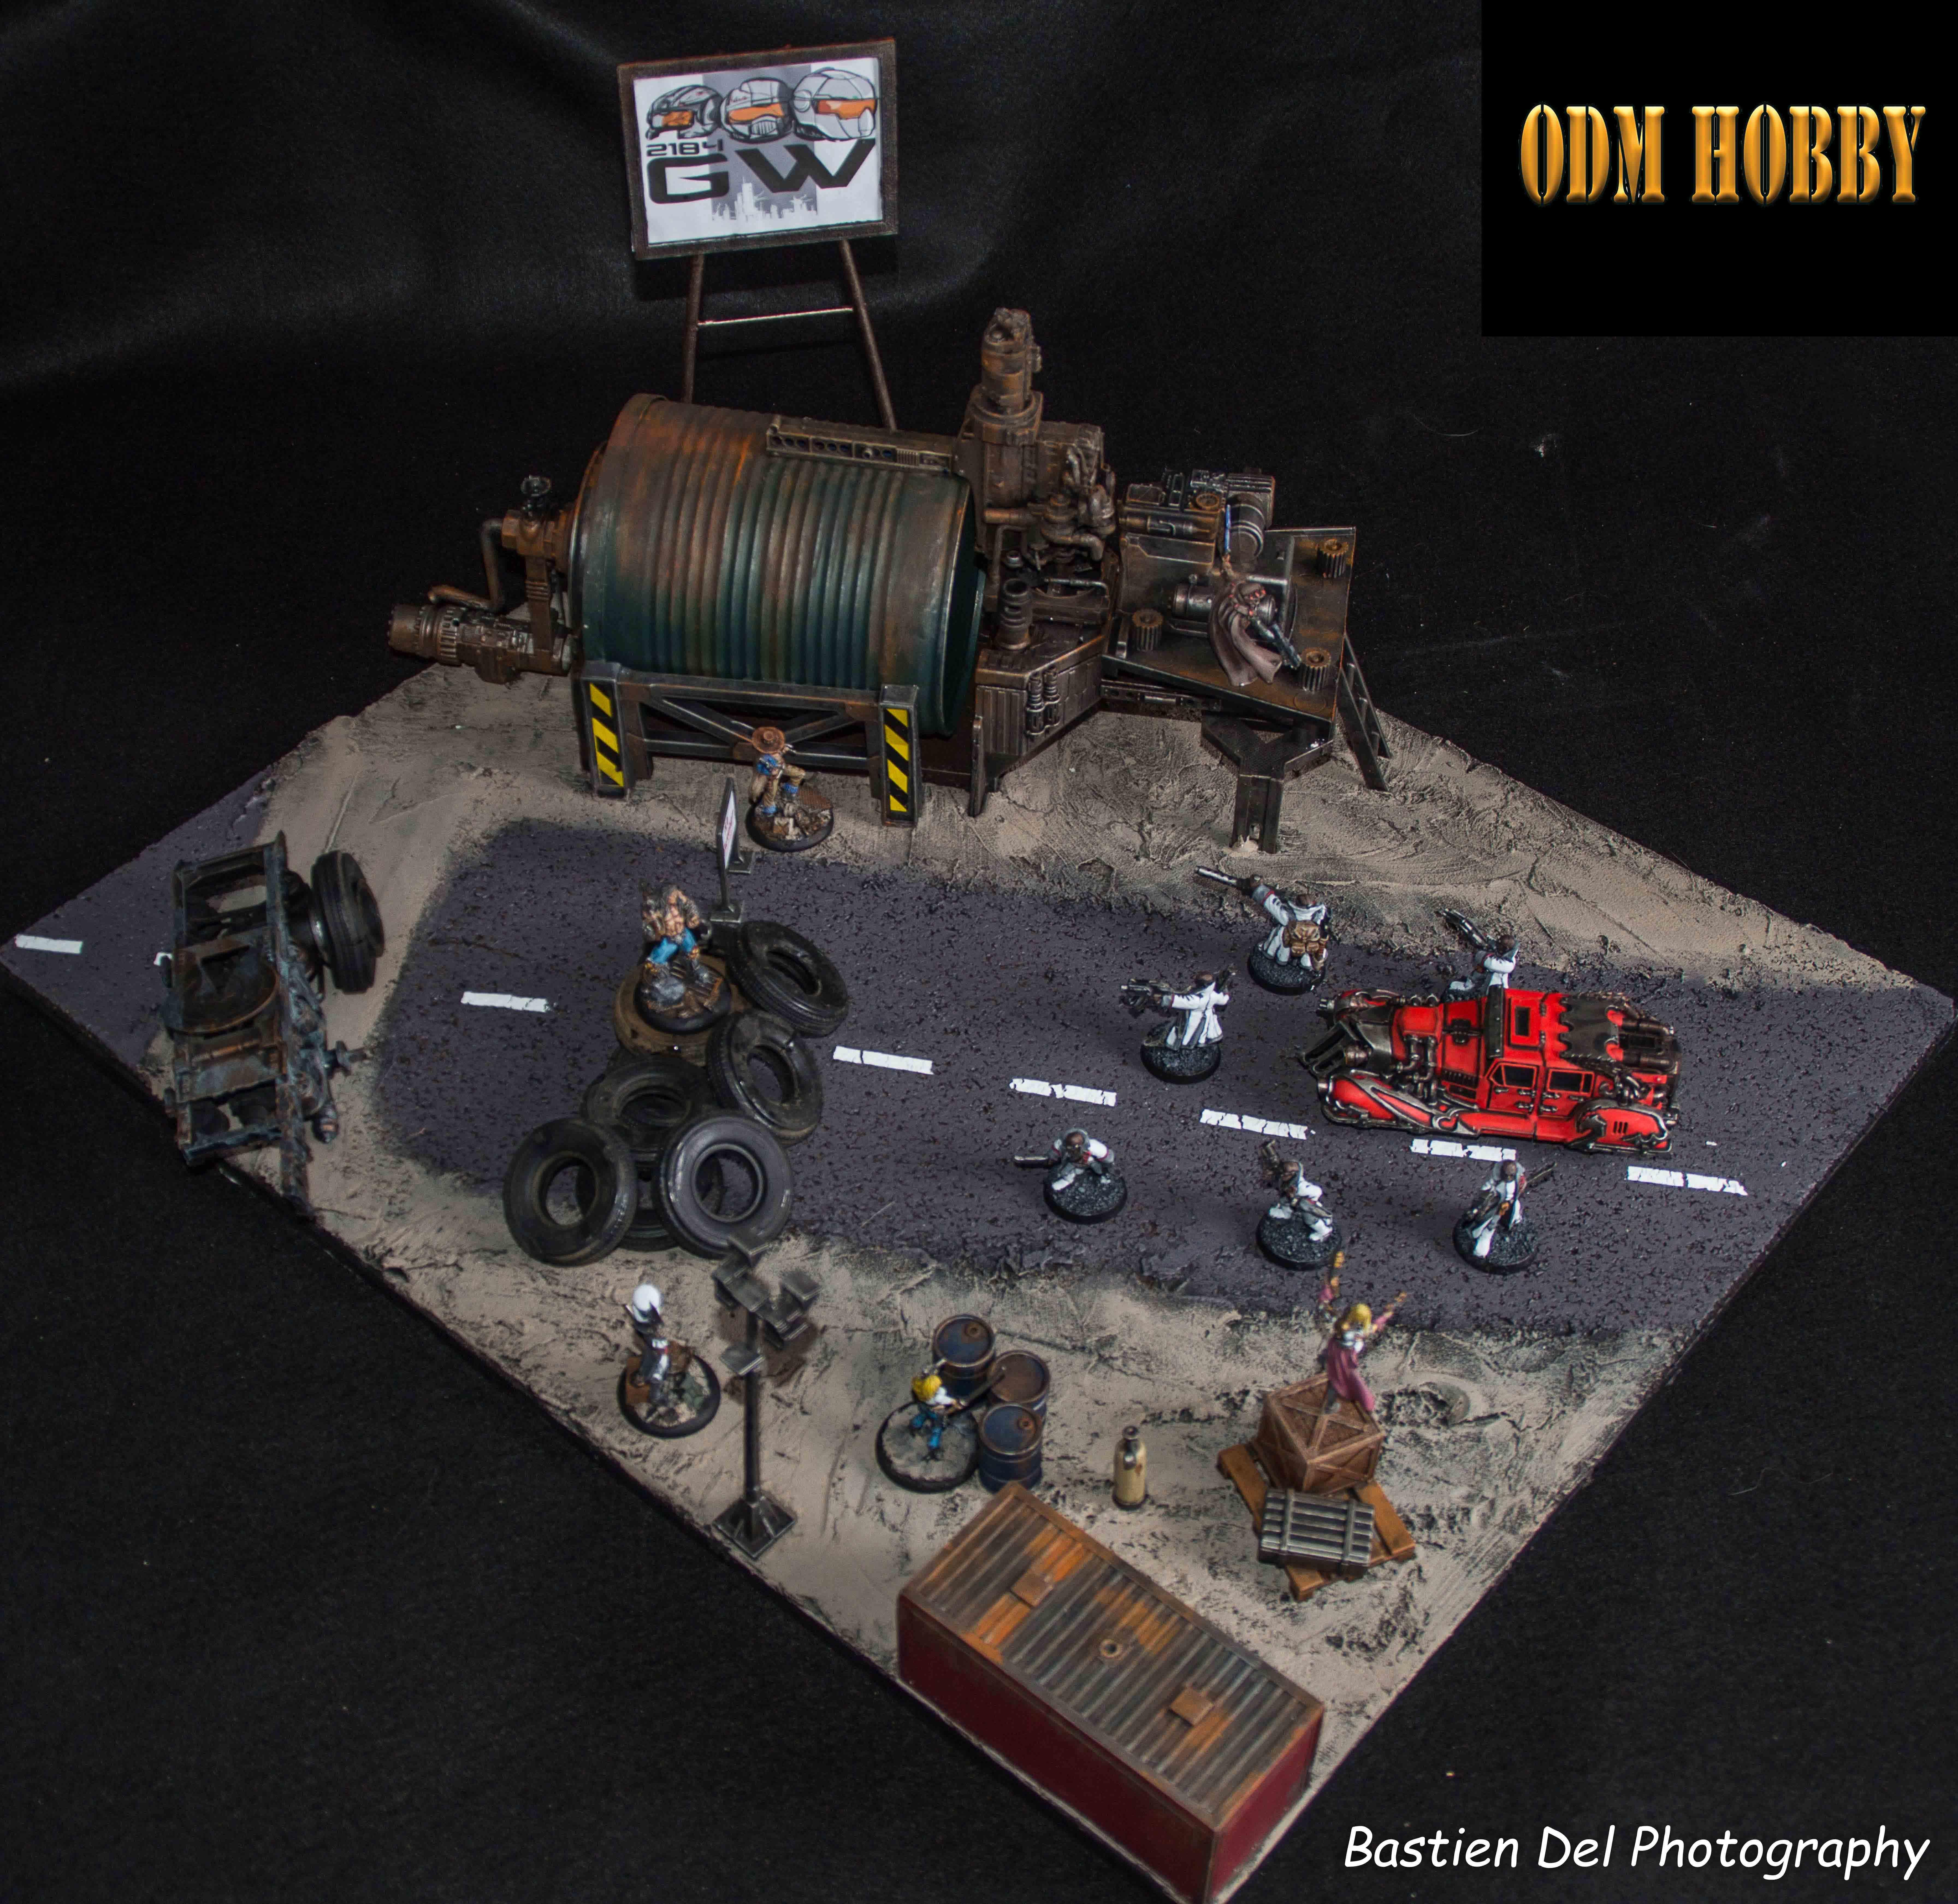 Generation war 2184-odm hobby-official game diorama